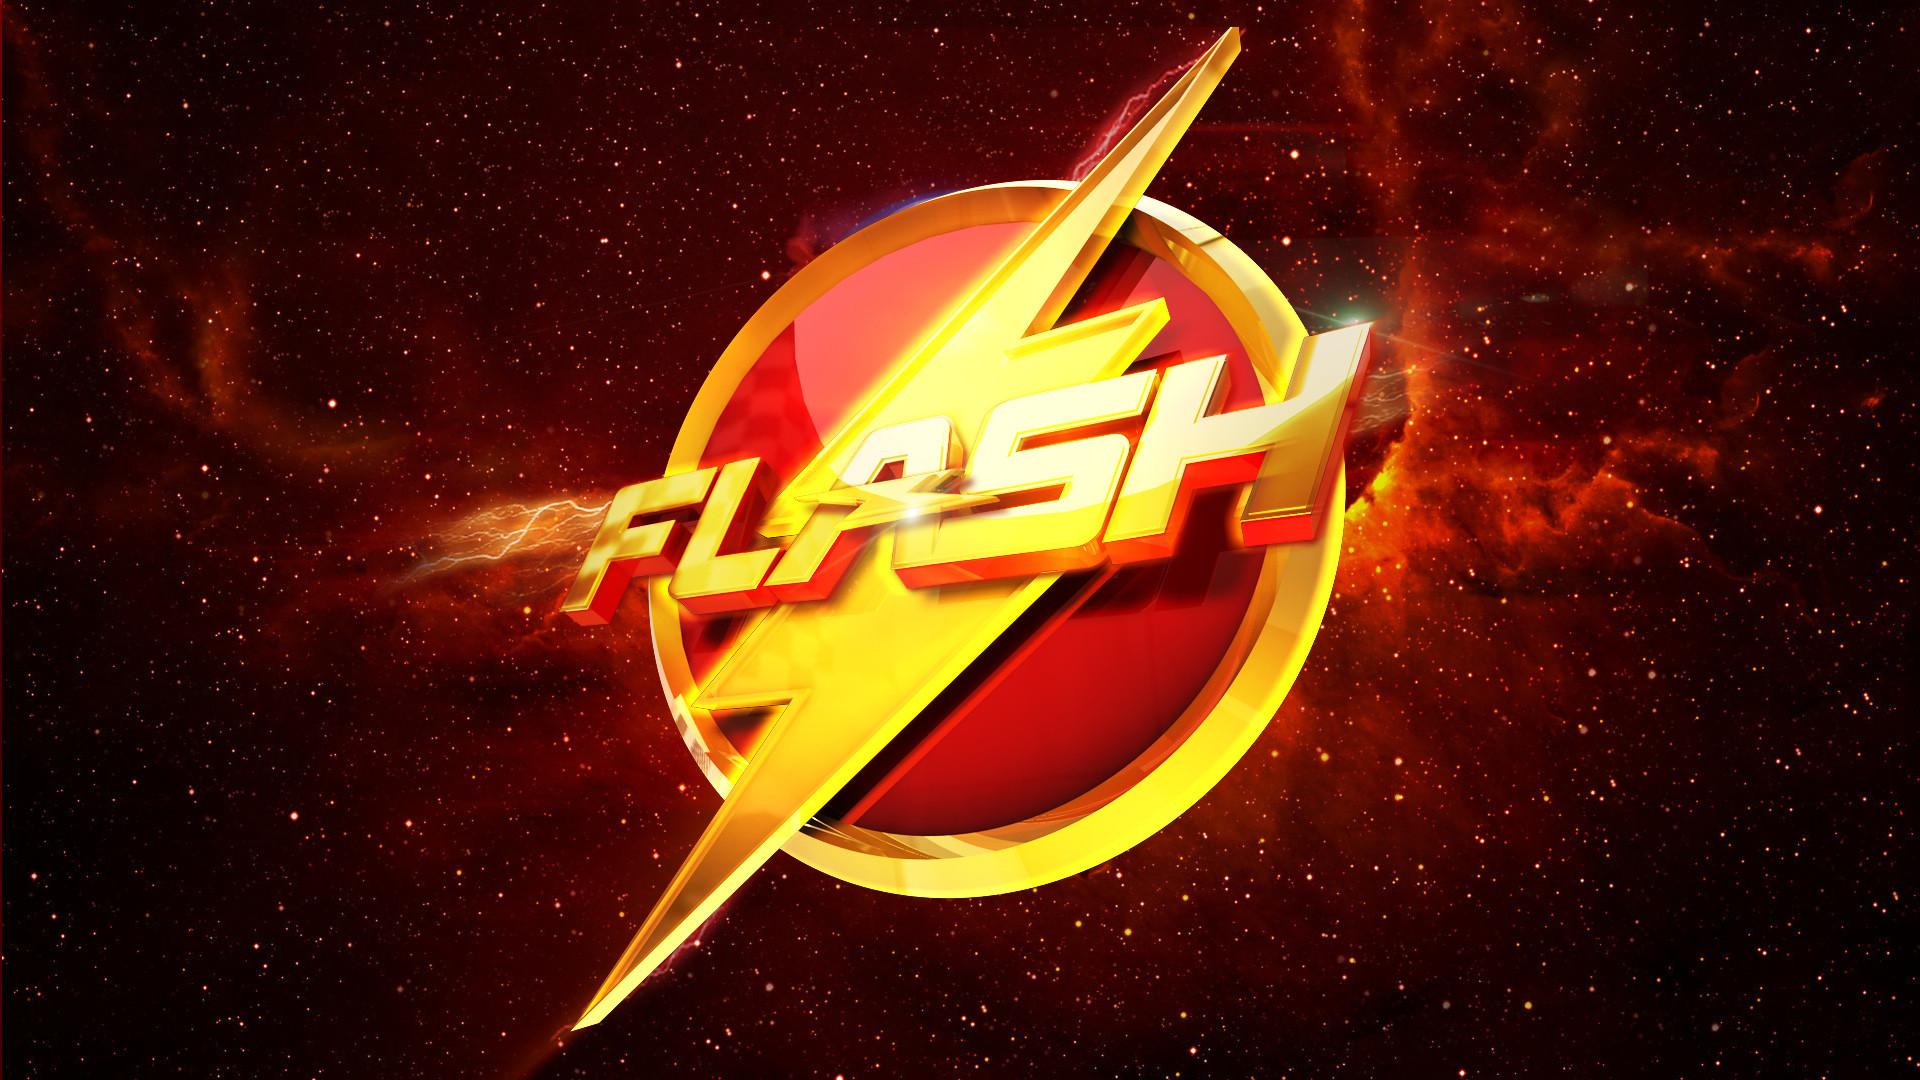 189 <b>Flash</b> HD <b>Wallpapers</